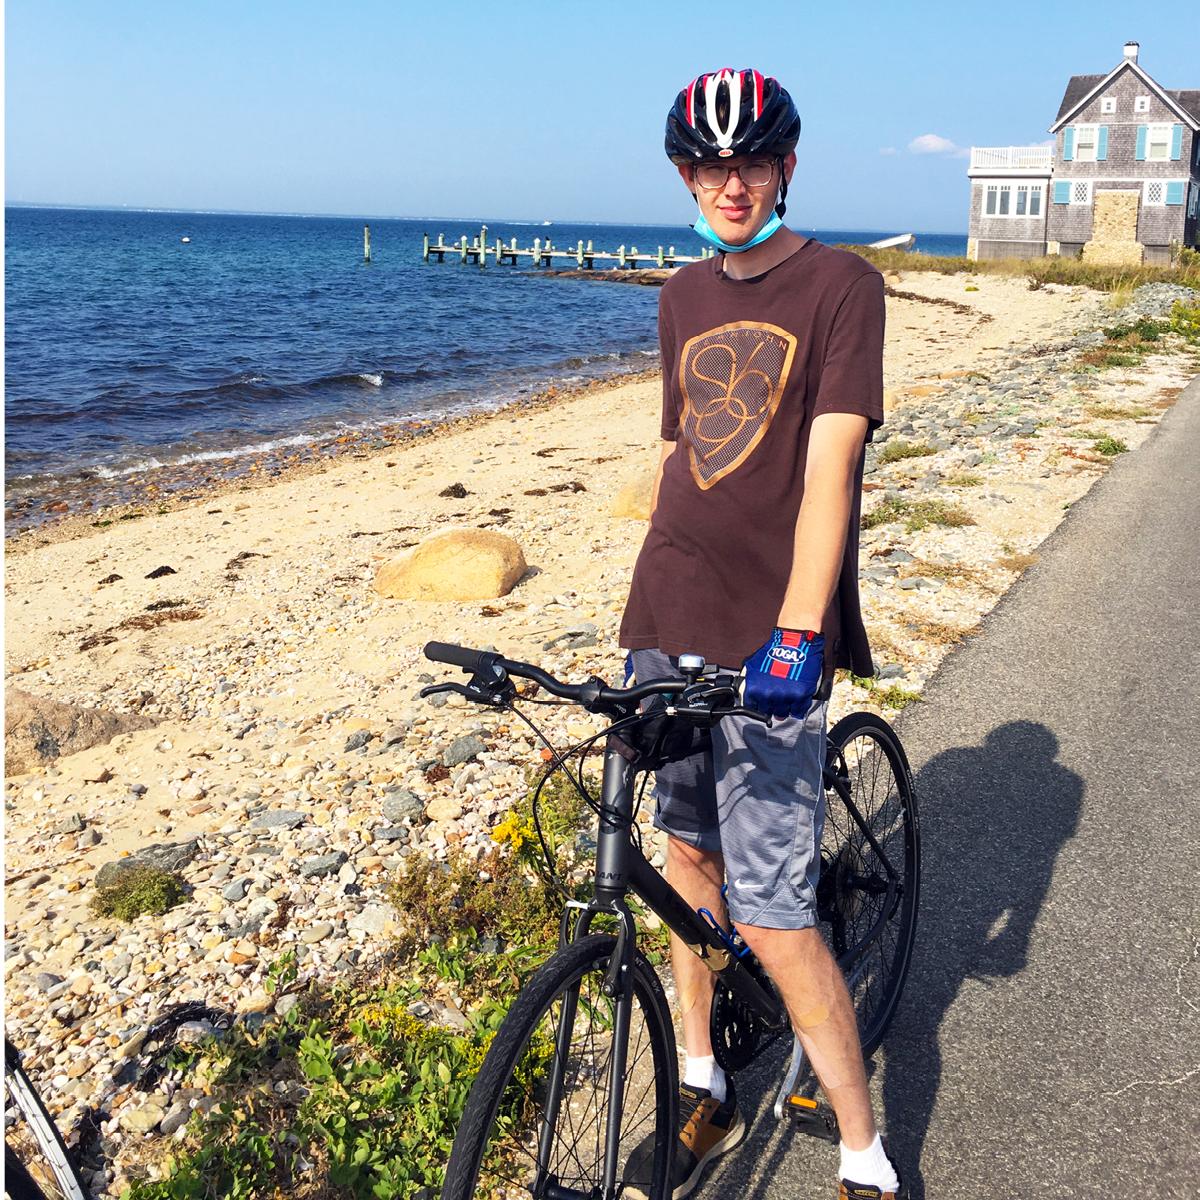 Tour de Shore rider Henry